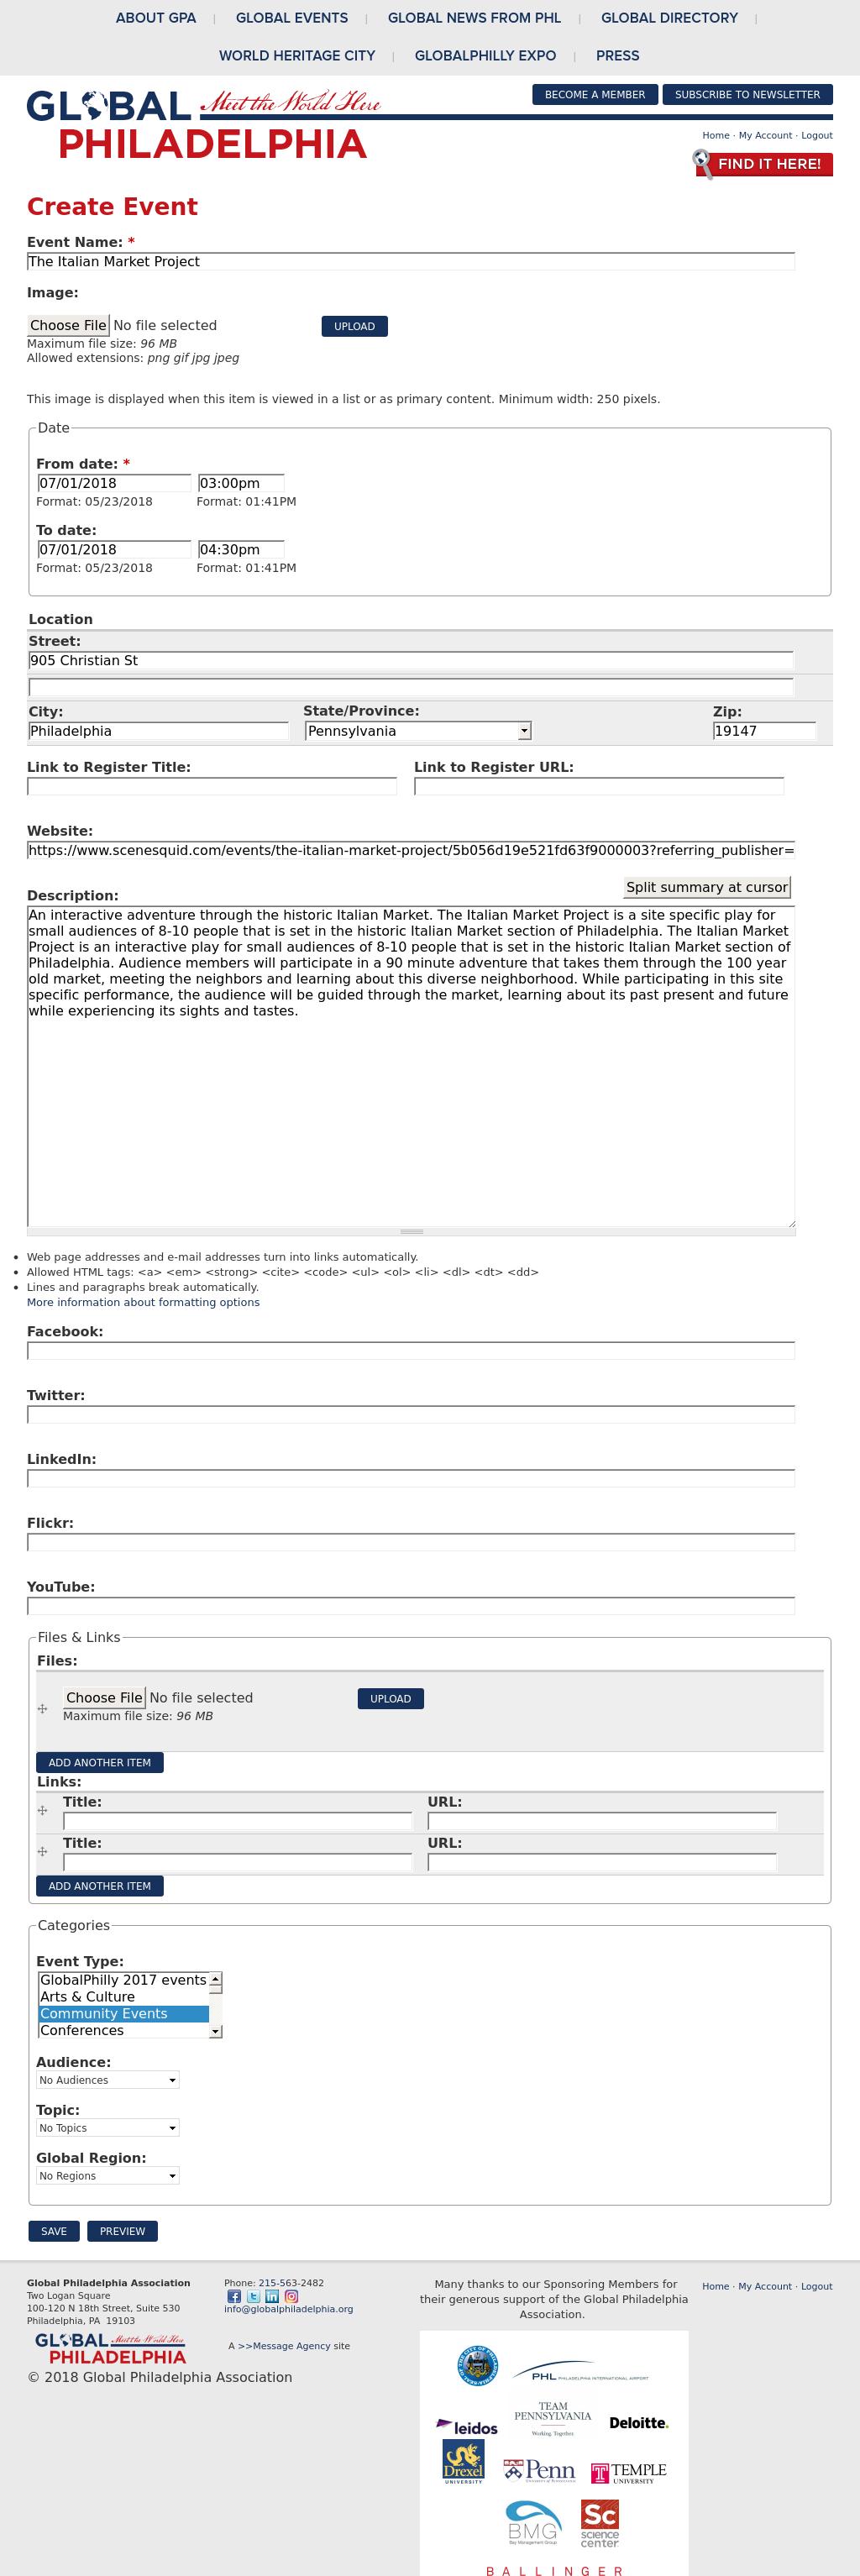 Screenshot from Global Philadelphia integration